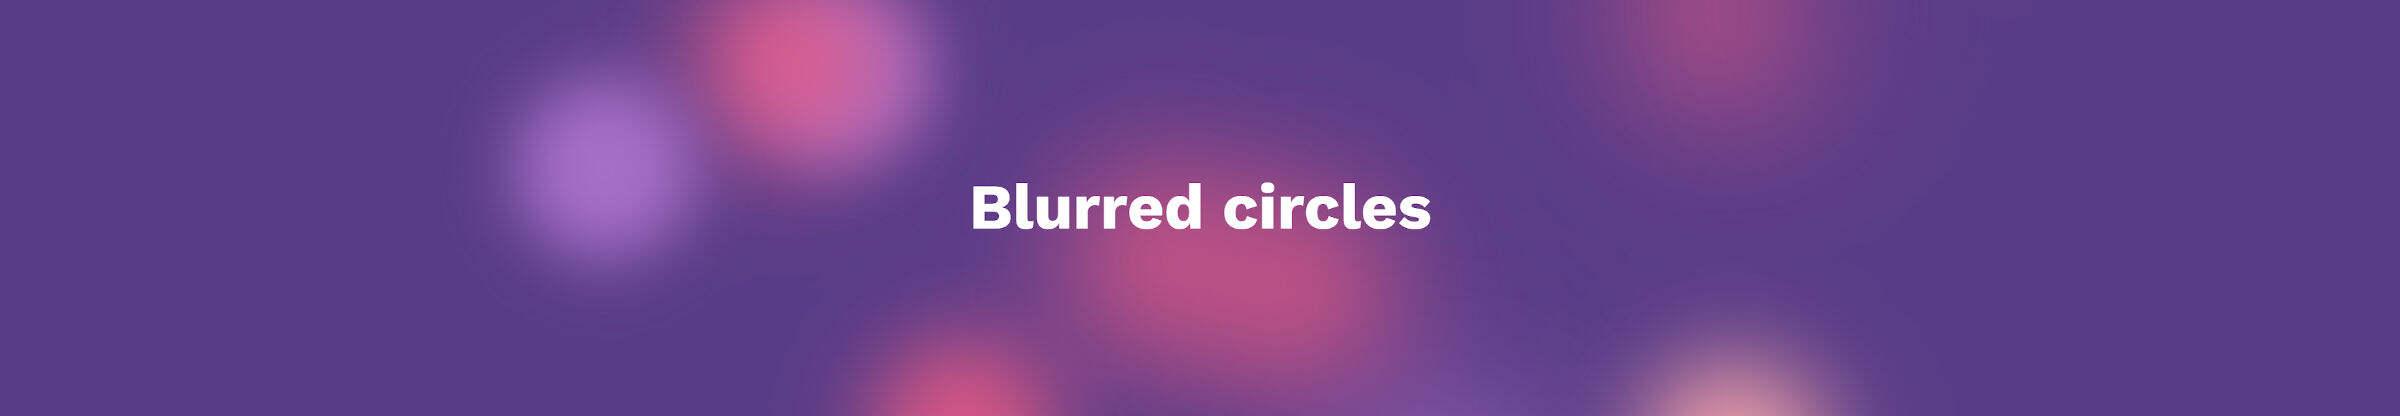 blurred circles动画效果